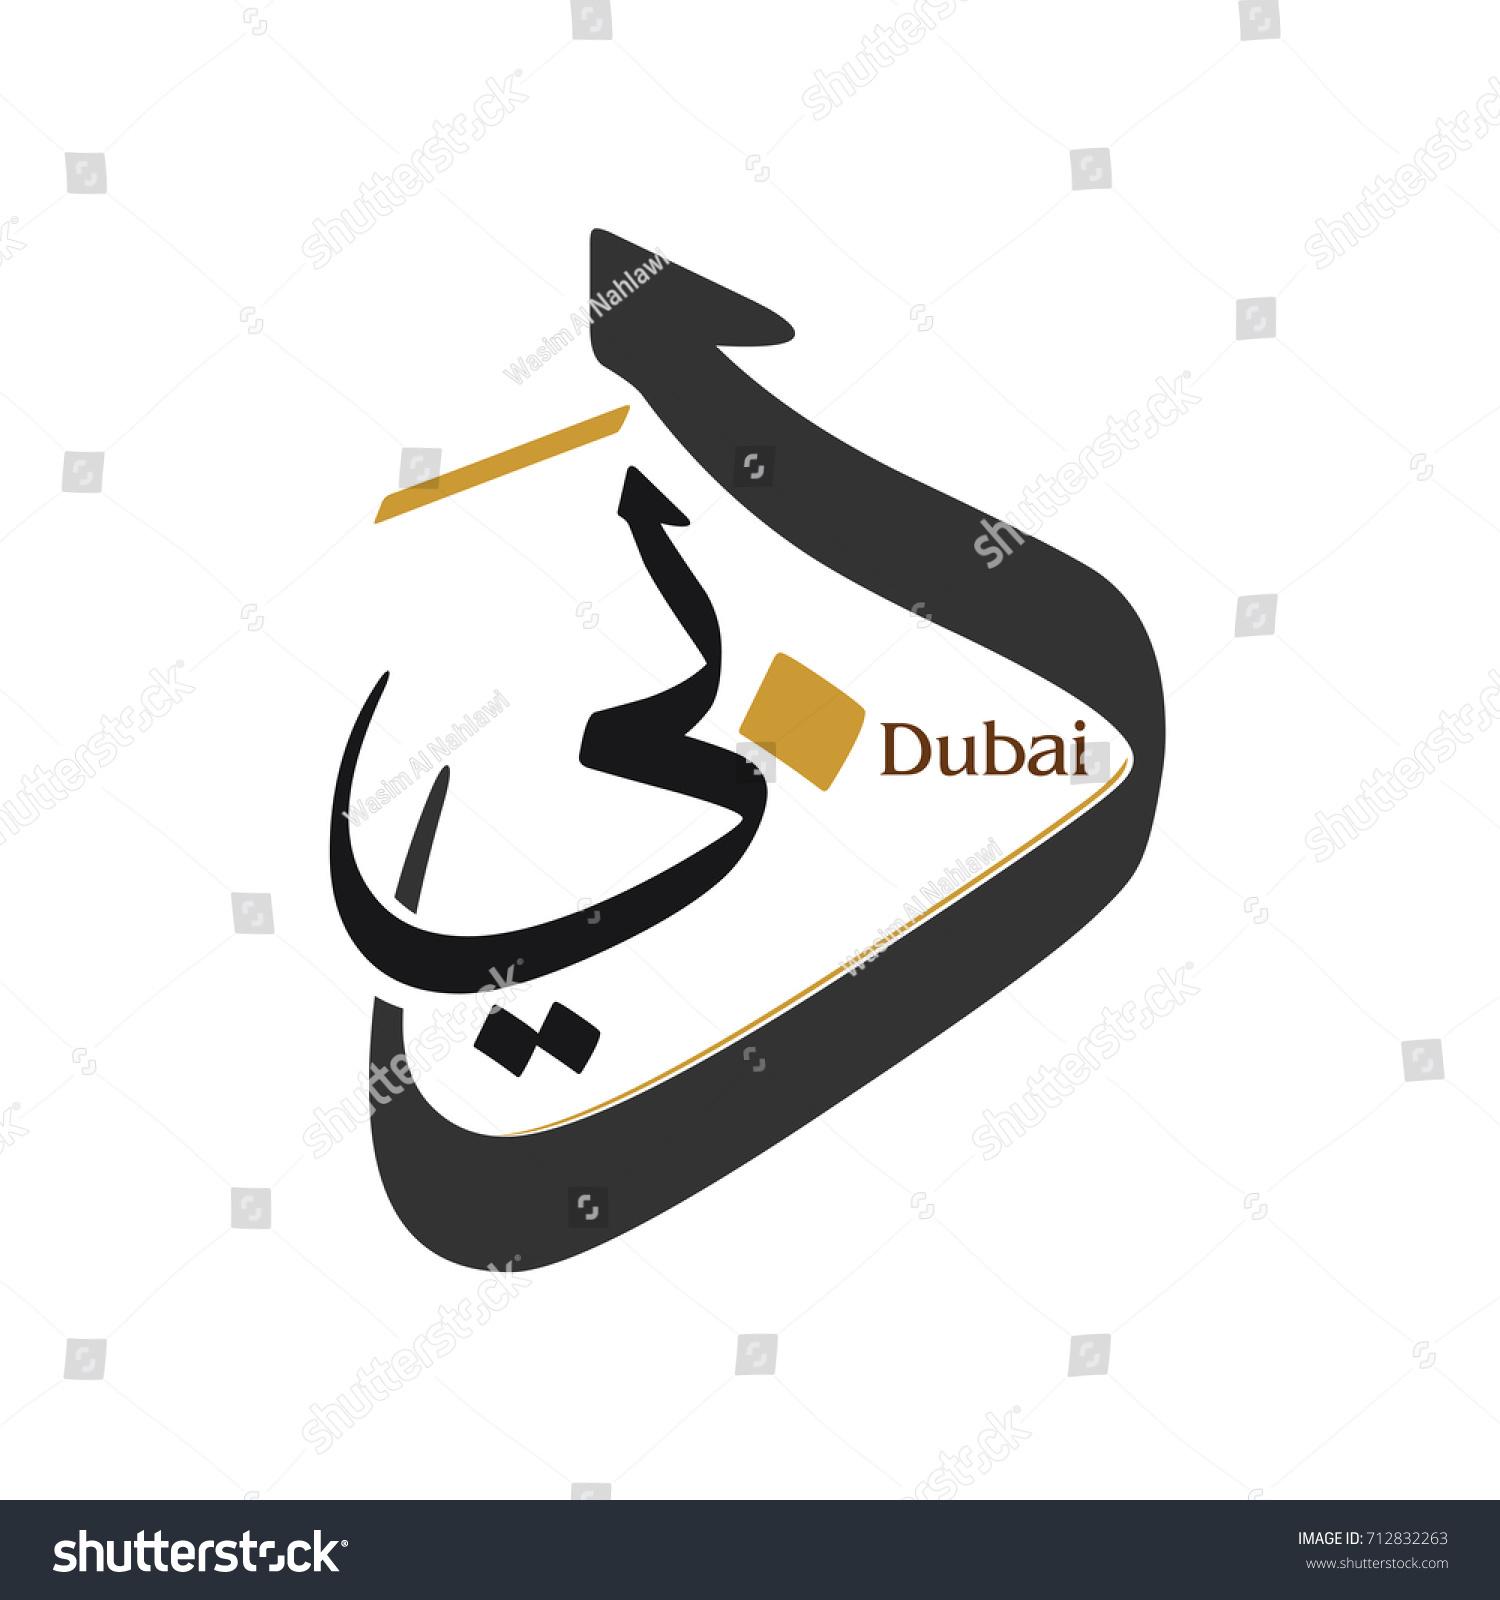 Arabic Calligraphy Translation Dubai City Word Stock